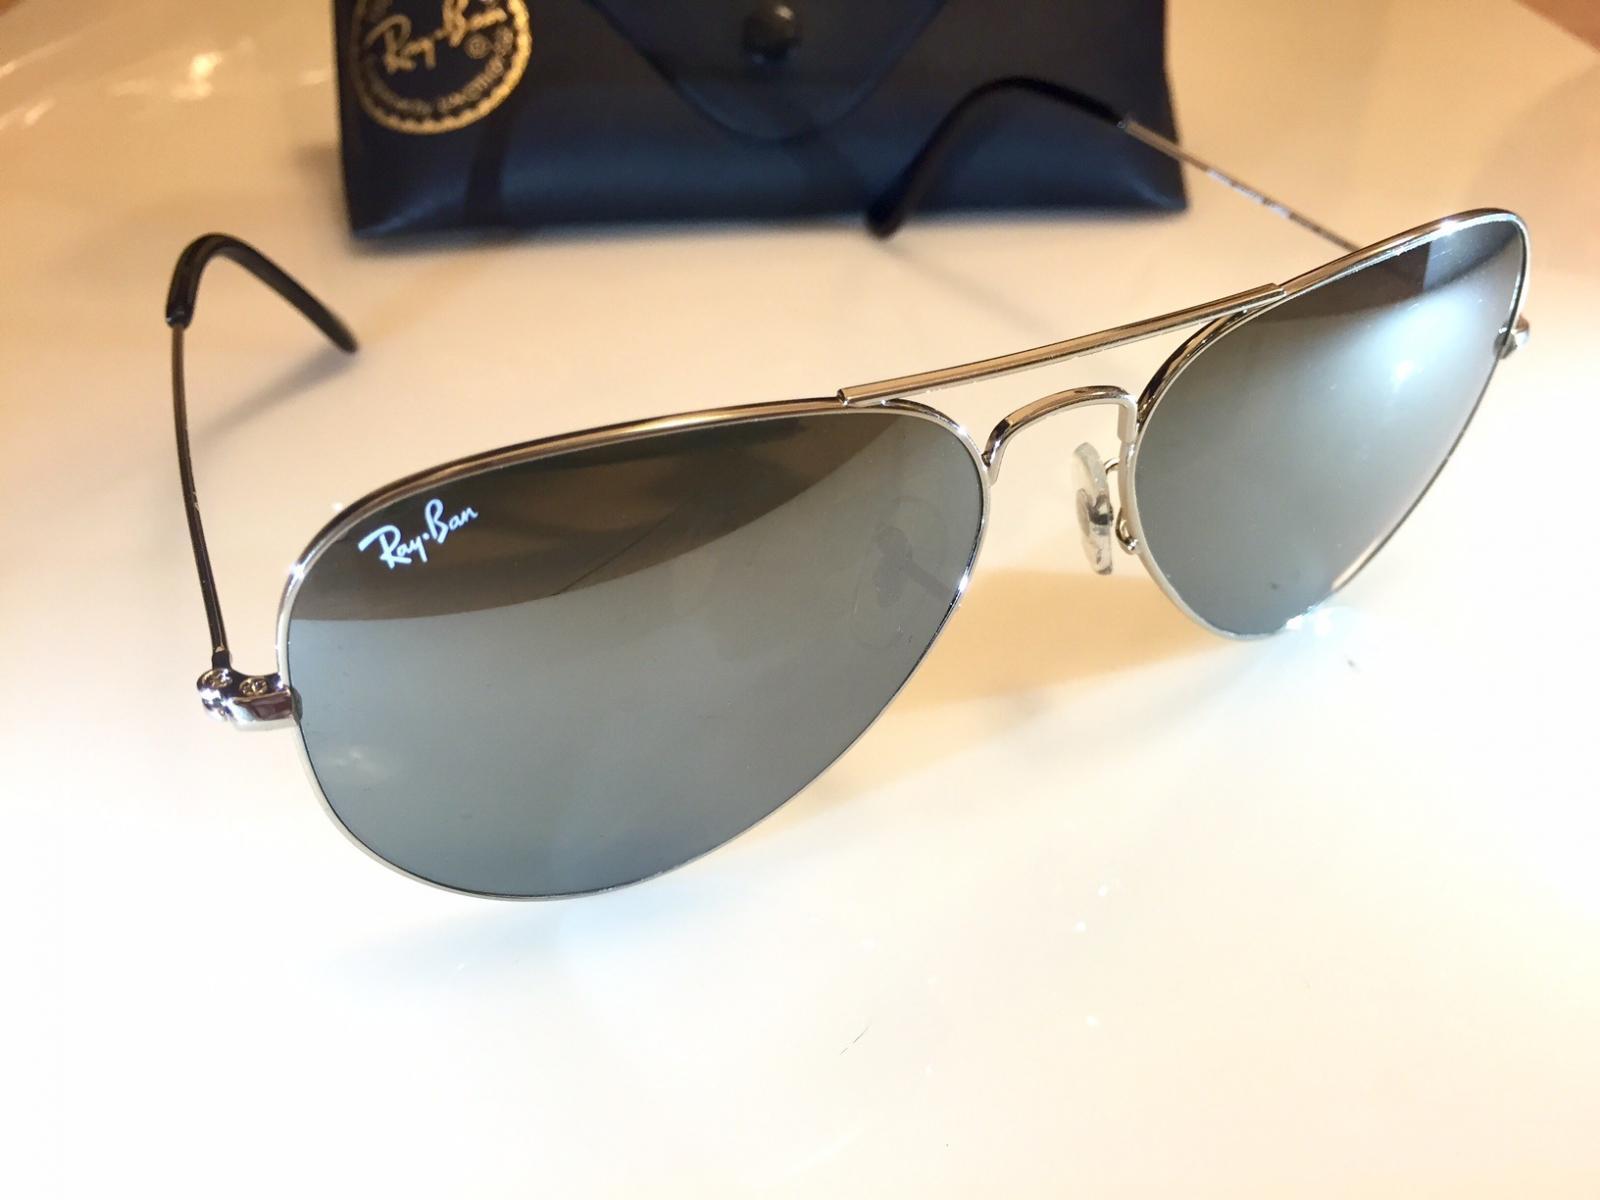 210aec072c9 Authentic Ray Ban Sunglasses 3025 G 15 Xlt Black L2823 « Heritage Malta